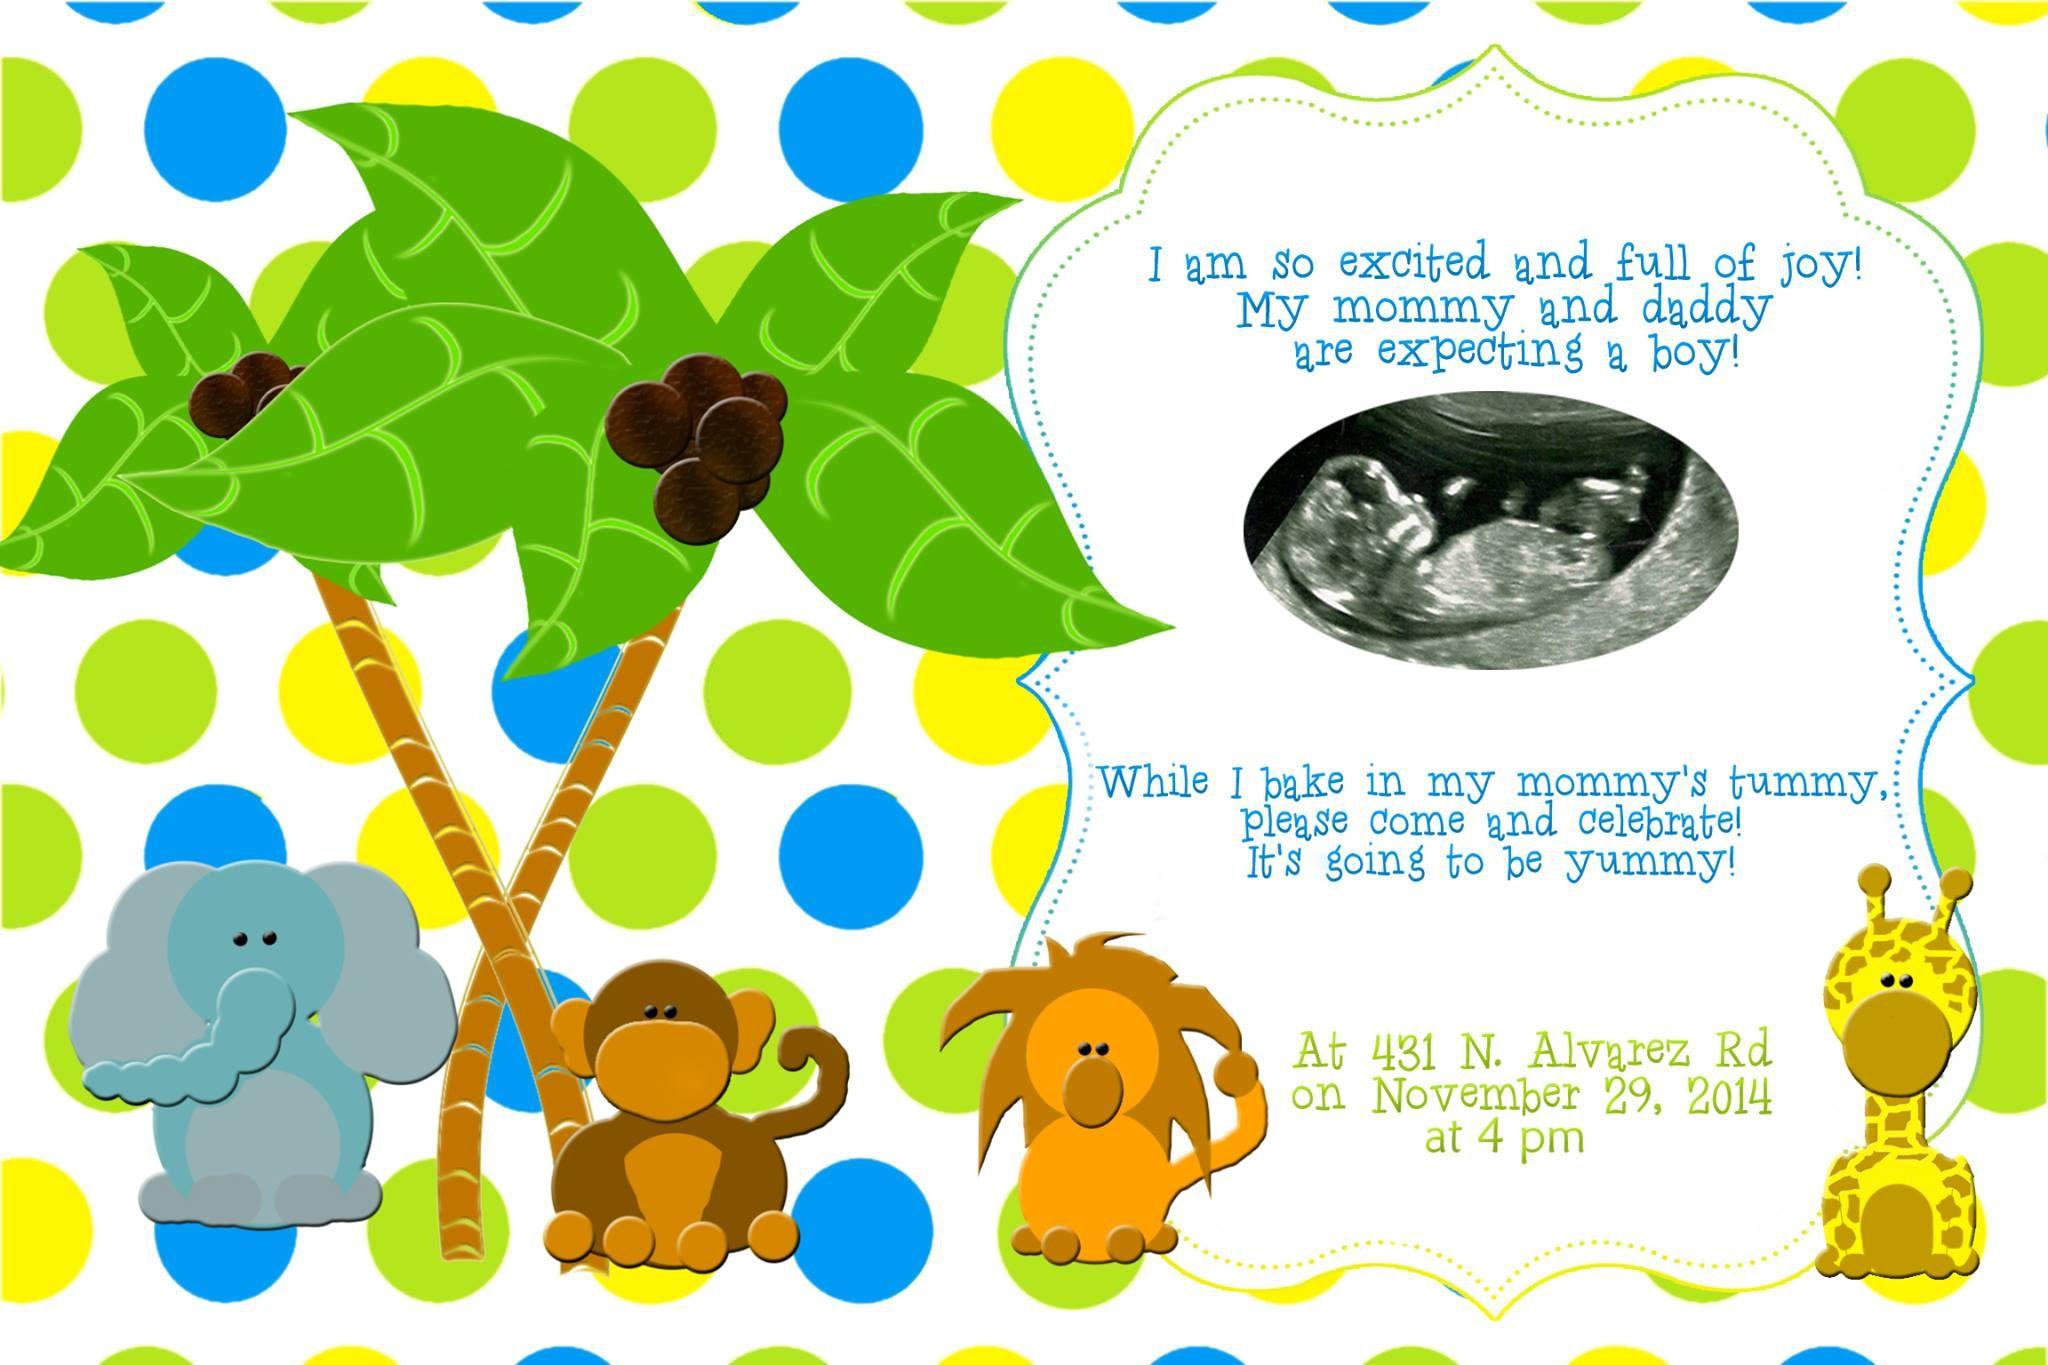 Baby Shower Invitation It's a boy!